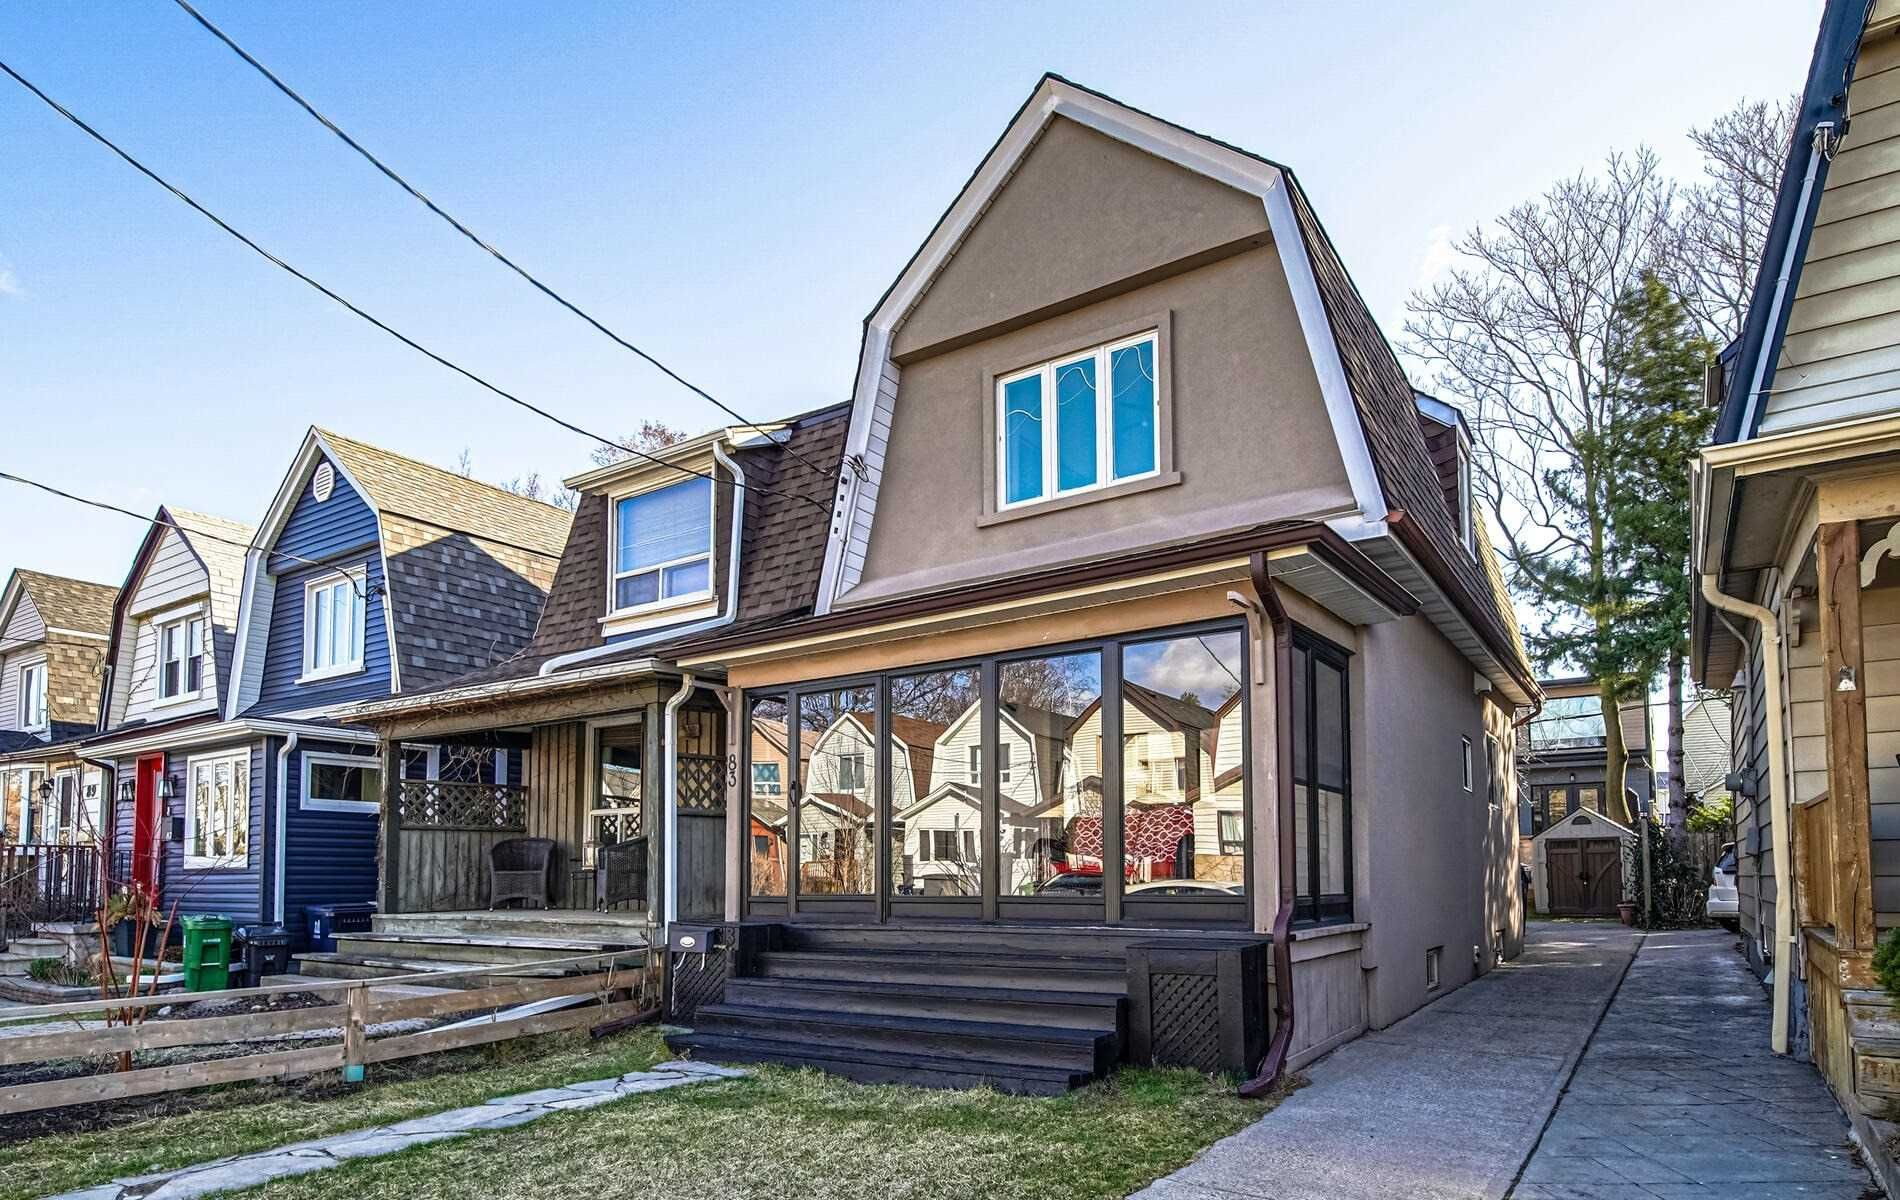 Main Photo: 83 Marlow Avenue in Toronto: Danforth Village-East York House (2-Storey) for sale (Toronto E03)  : MLS®# E5172247